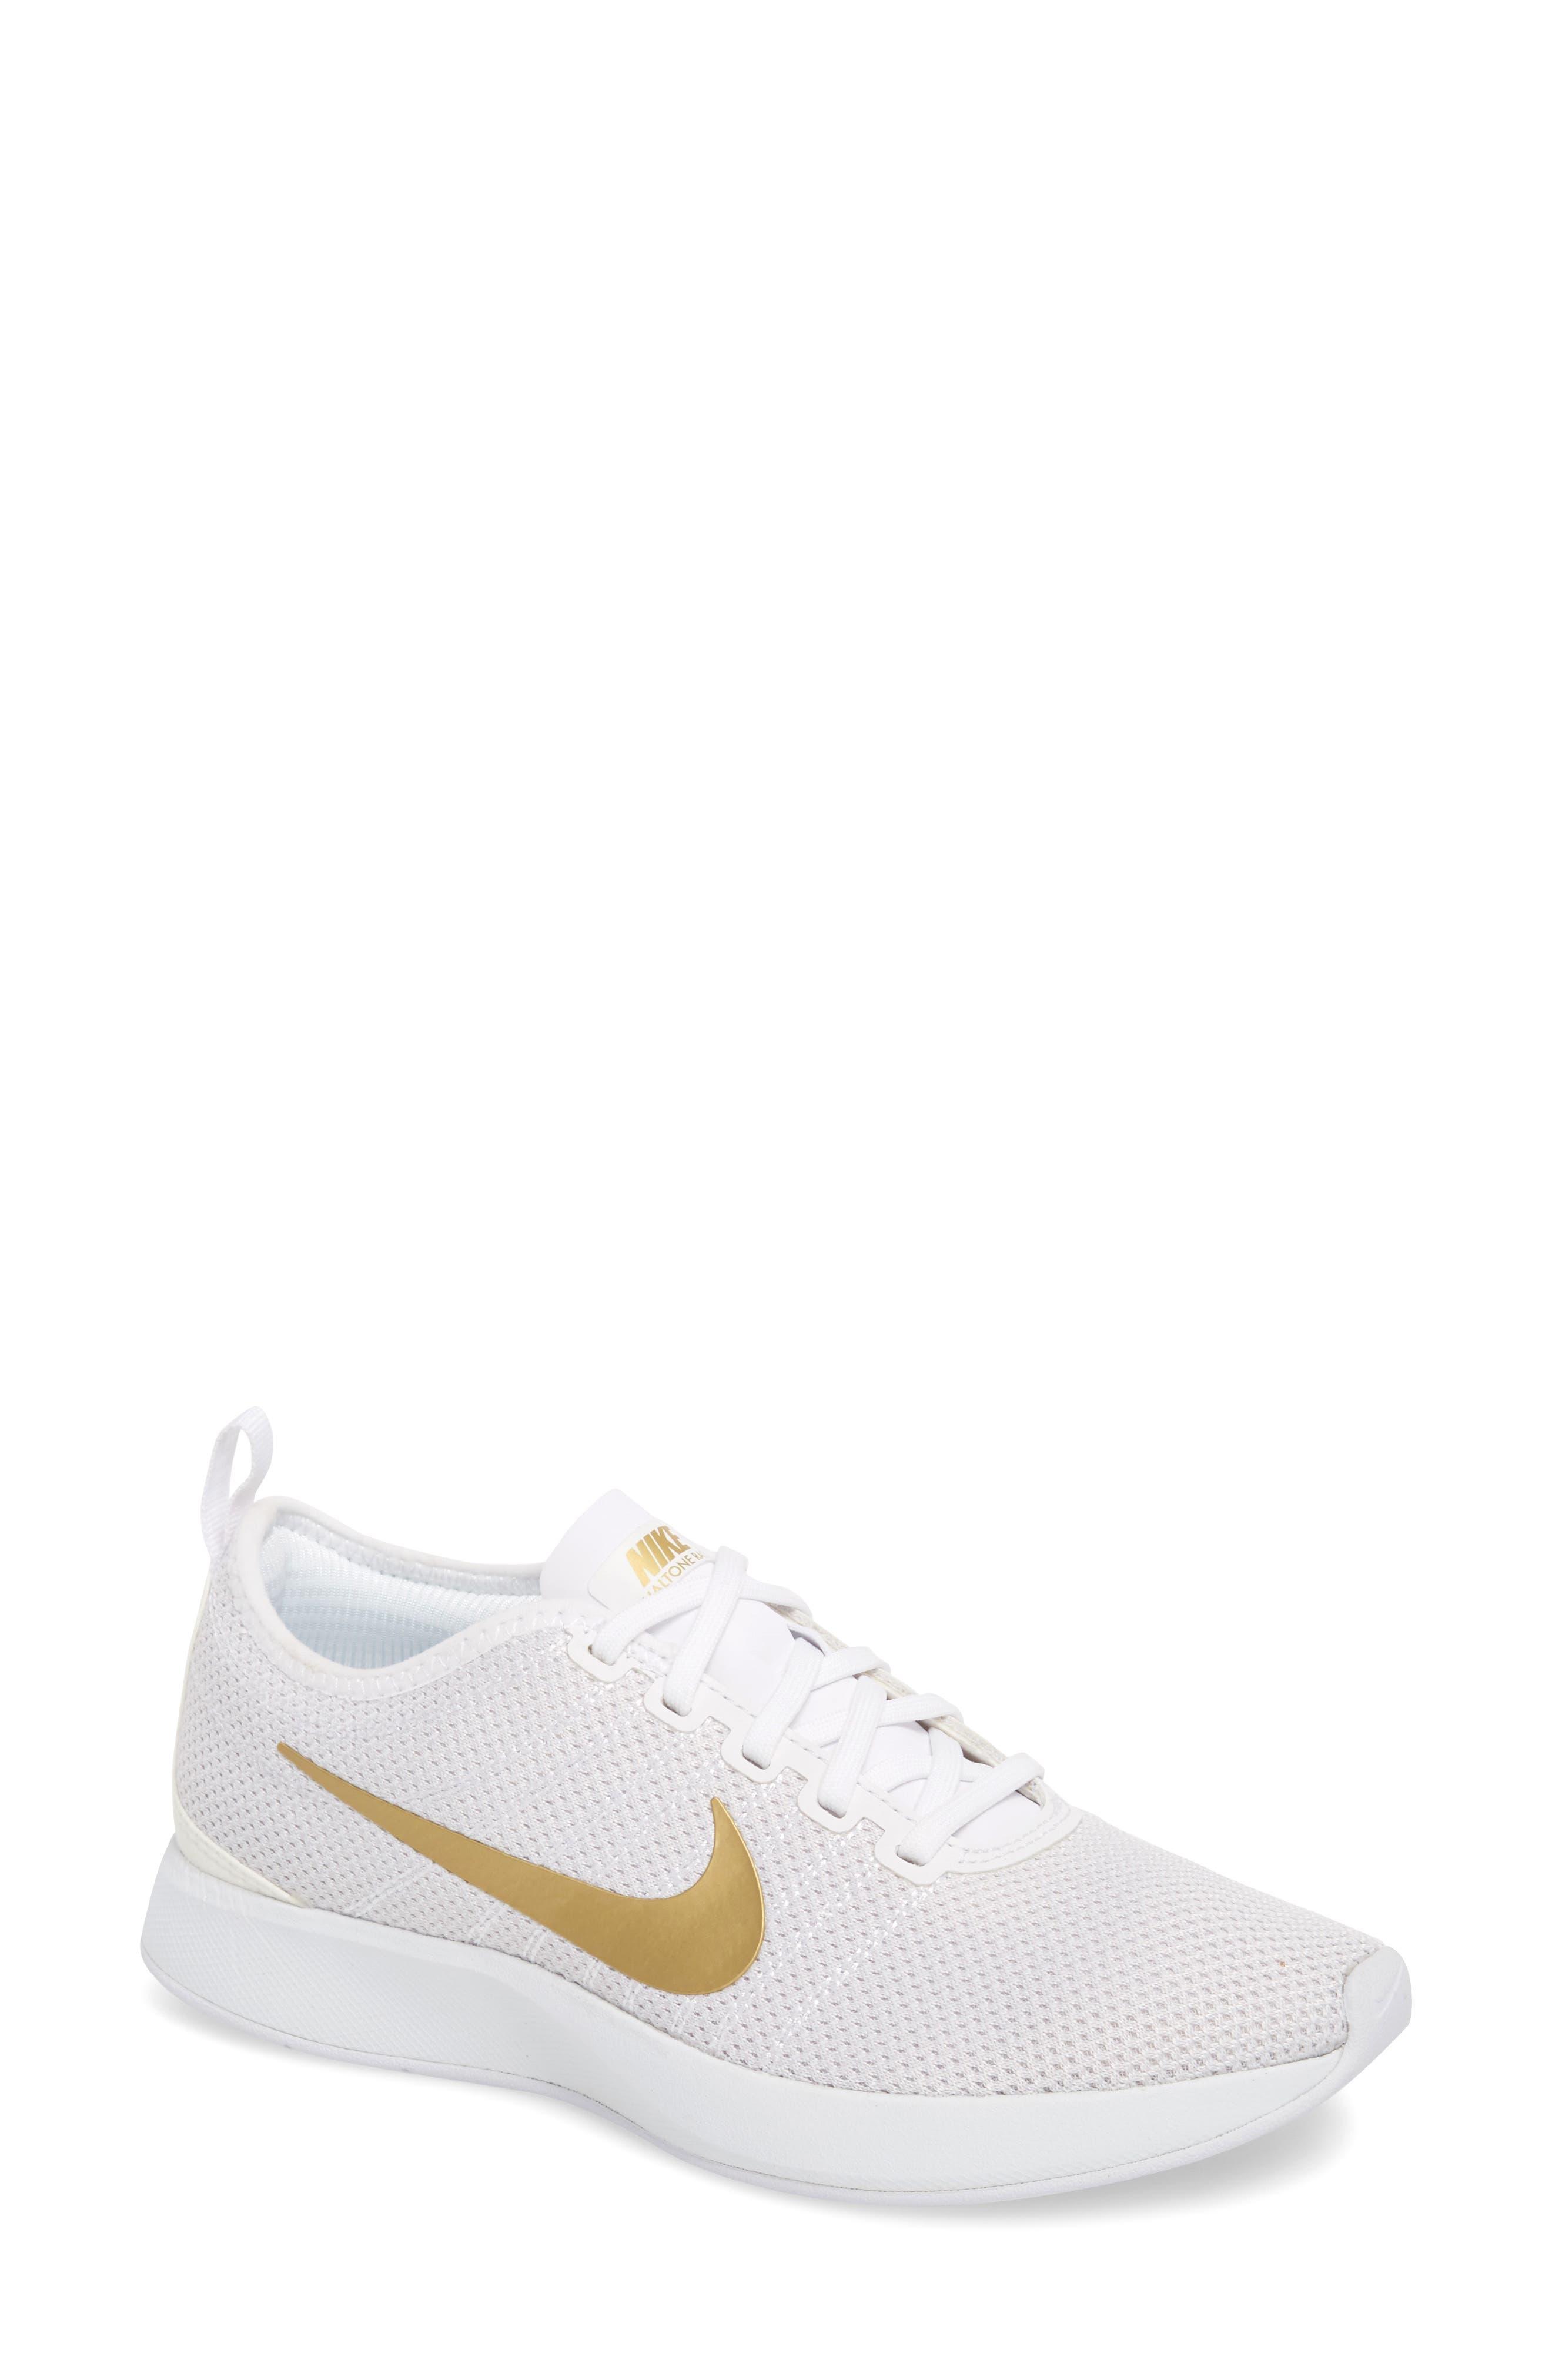 6d679096f97 Nike Dualtone Racer Se Sneaker In White  Metallic Gold